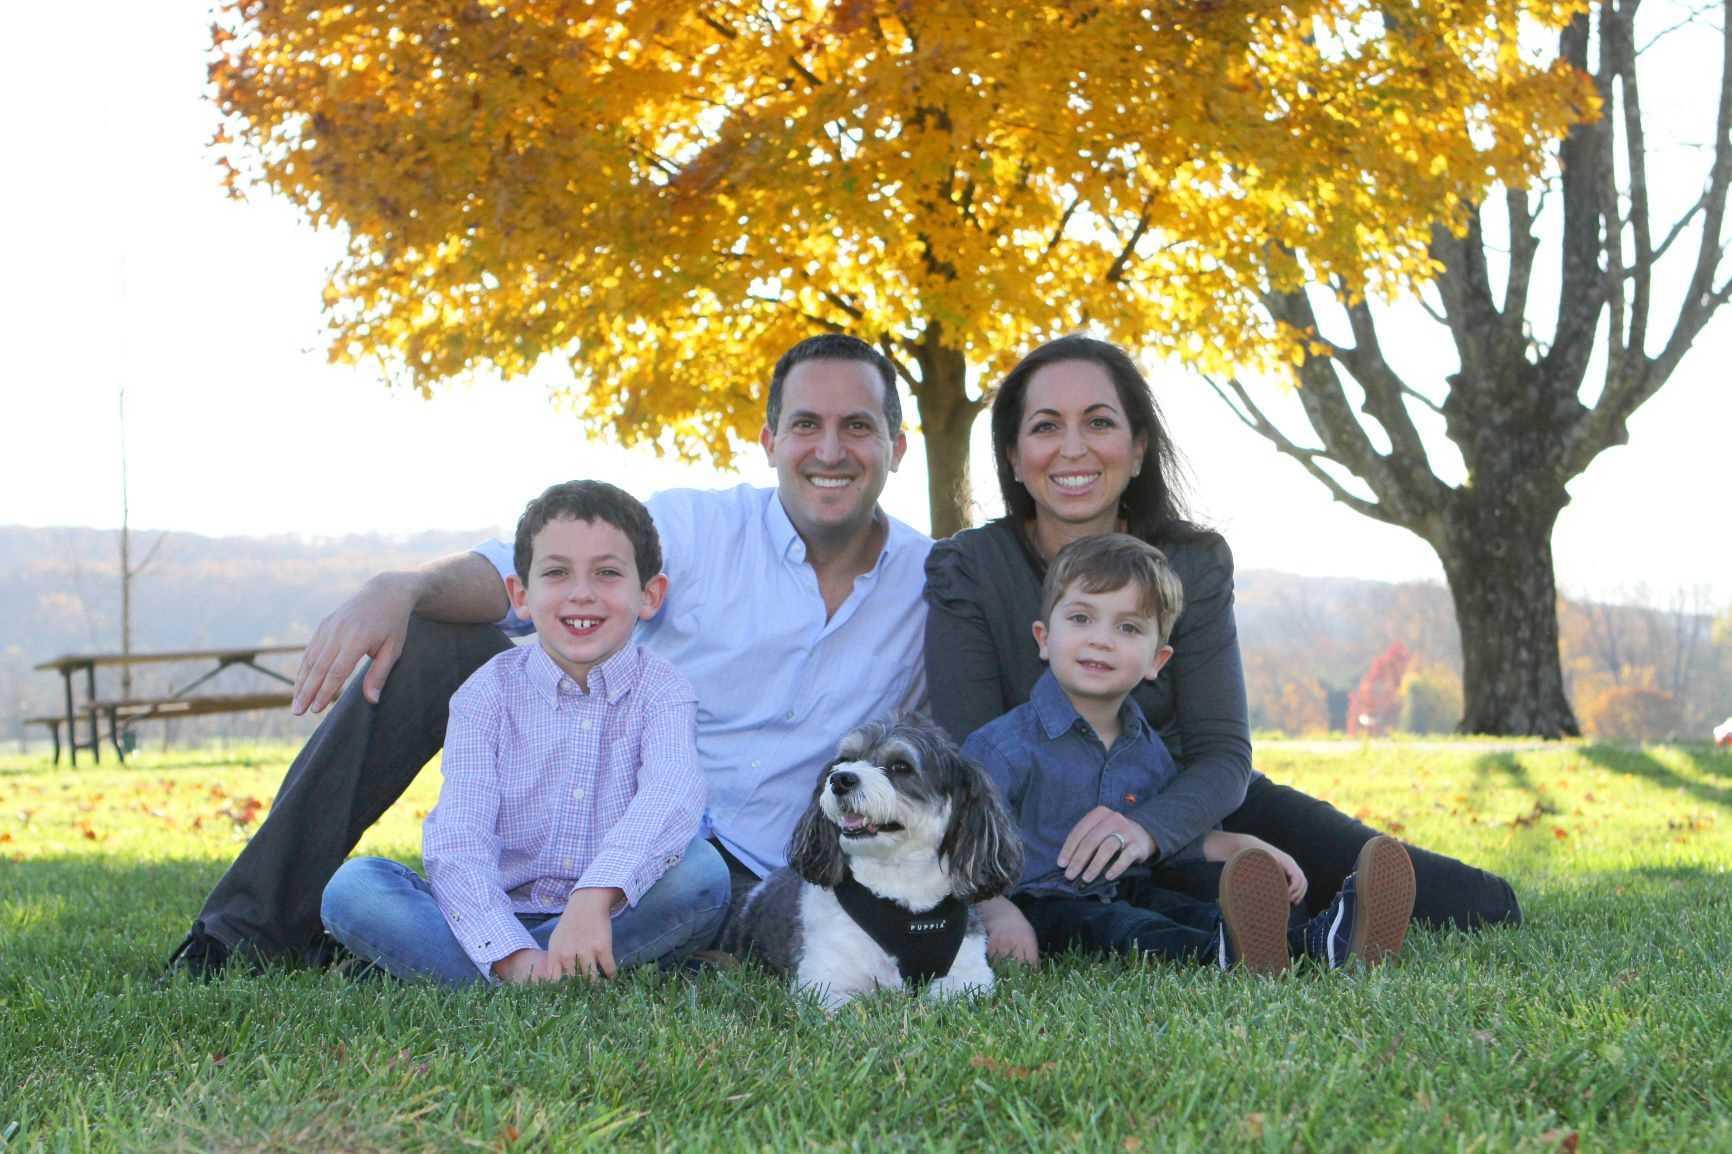 Wynn family photo